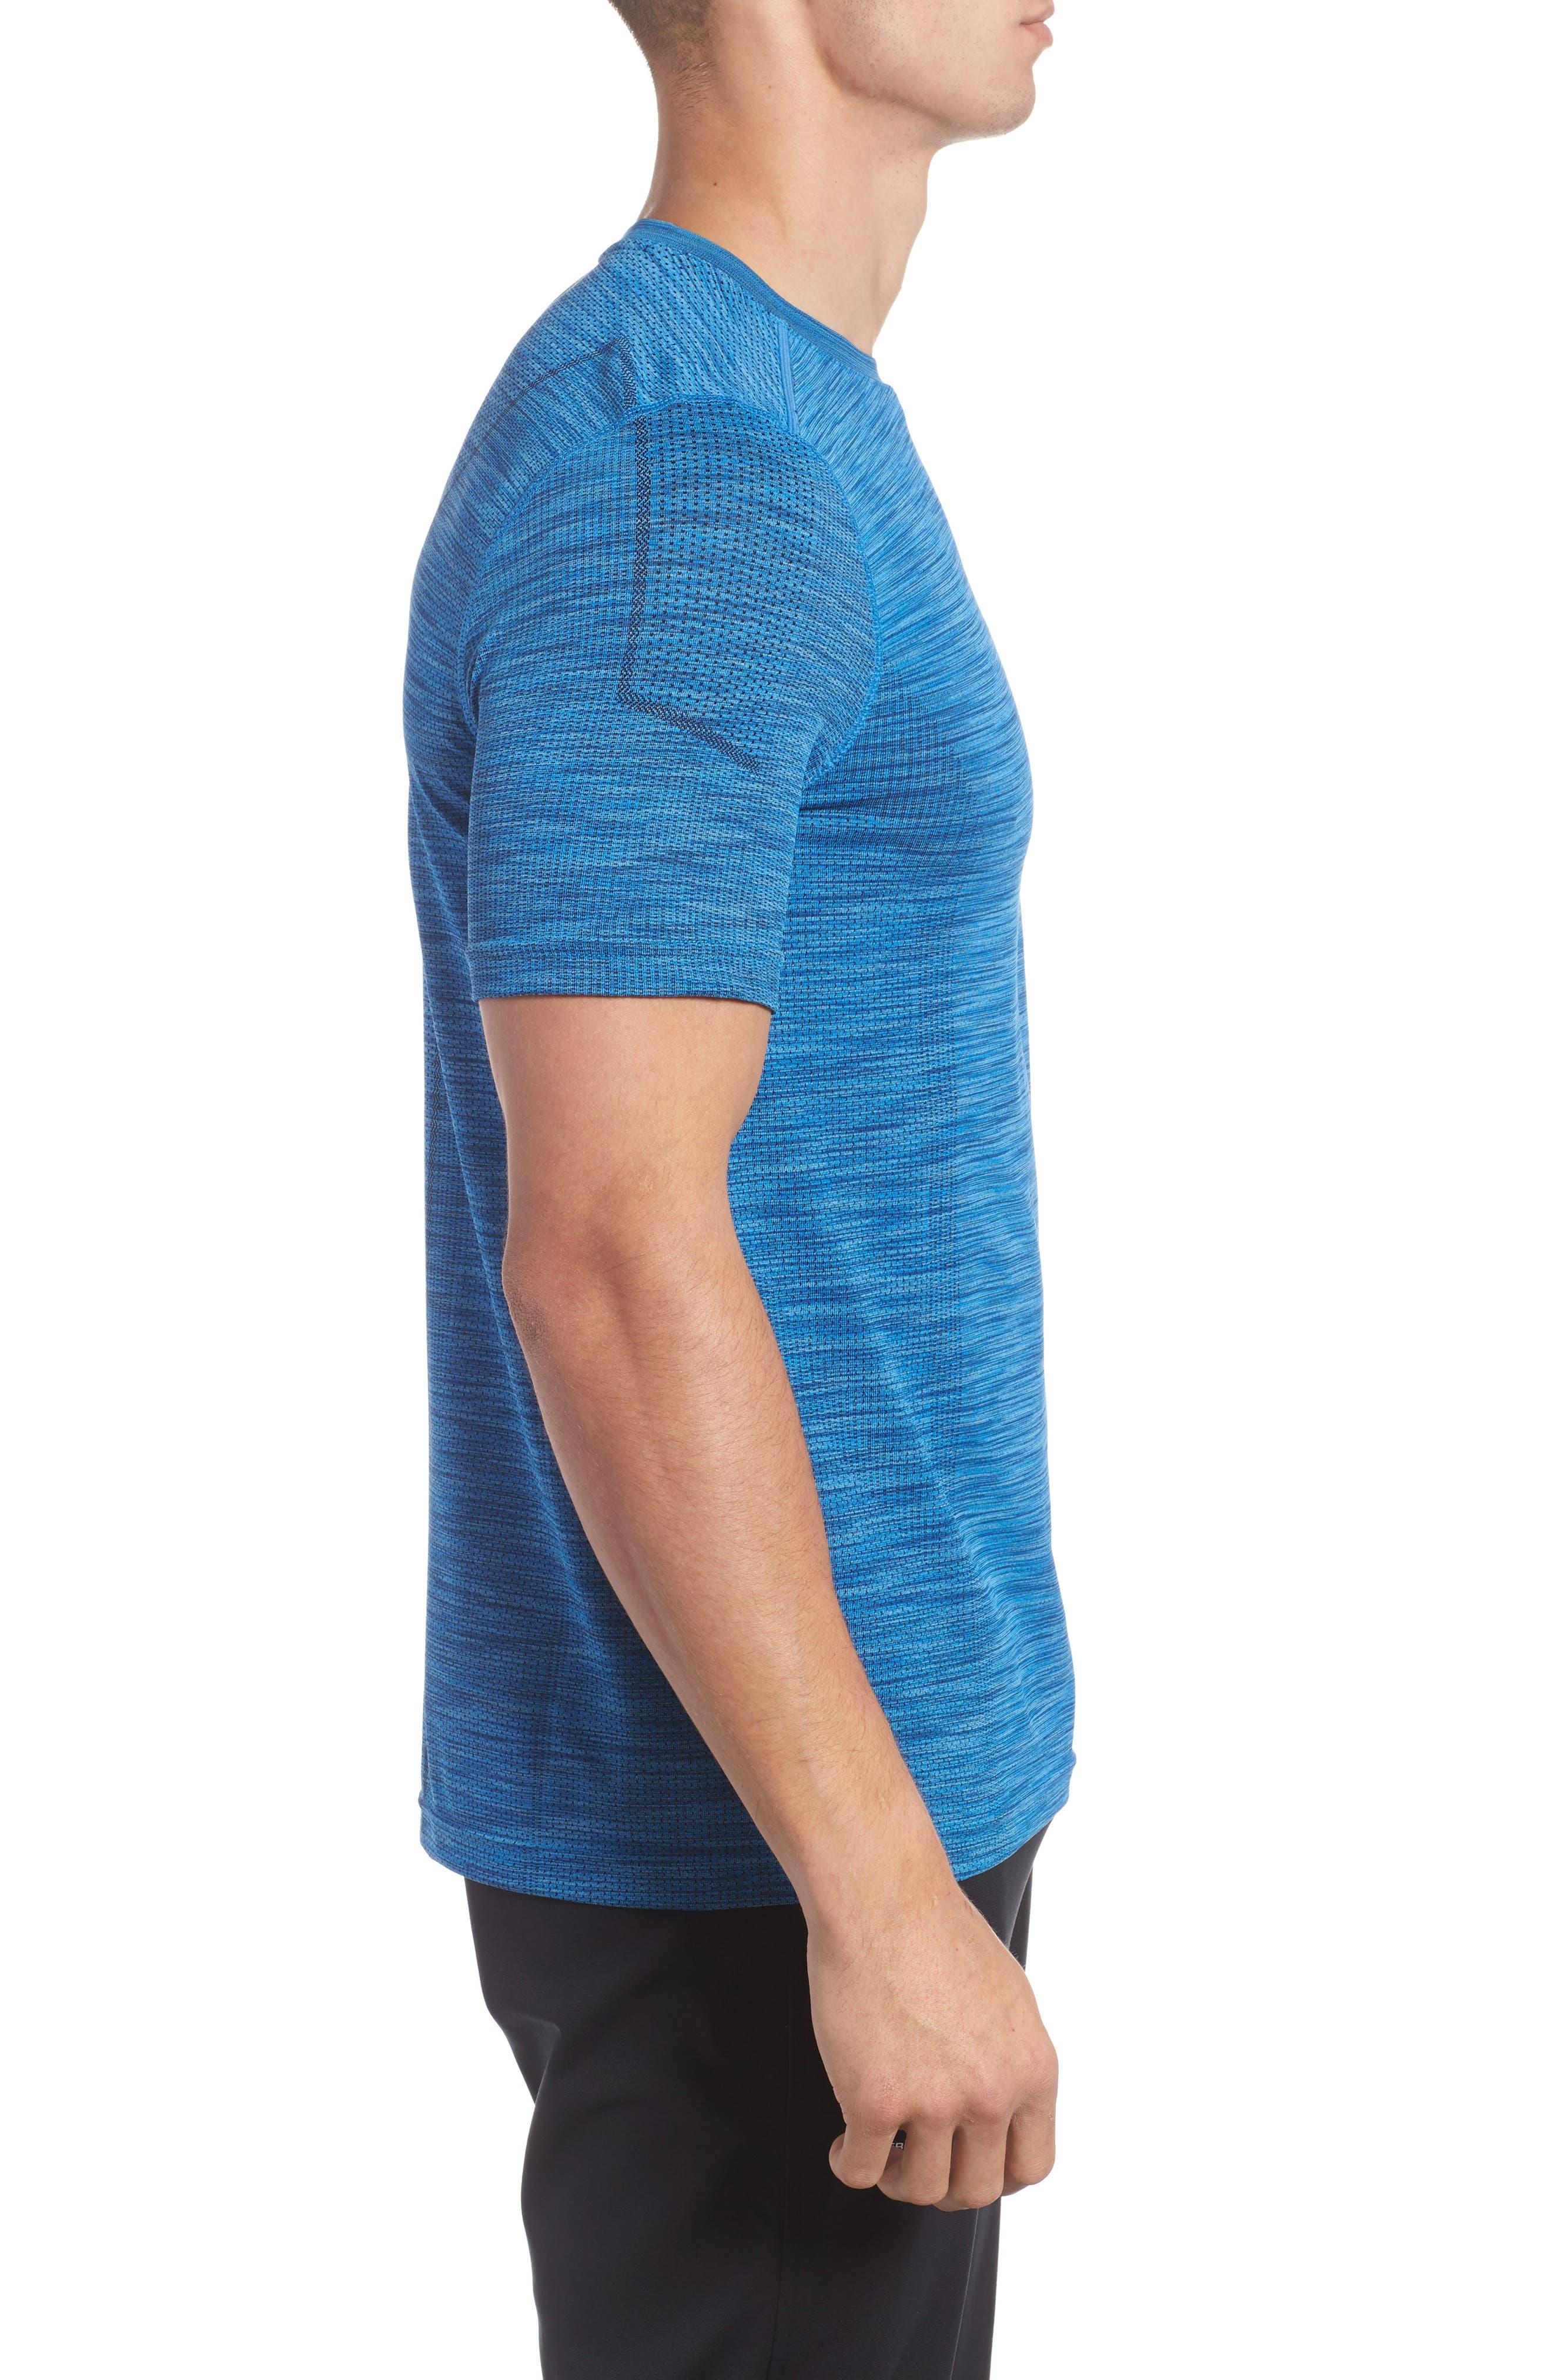 Alternate Image 3  - Under Armour Threadborne Regular Fit T-Shirt